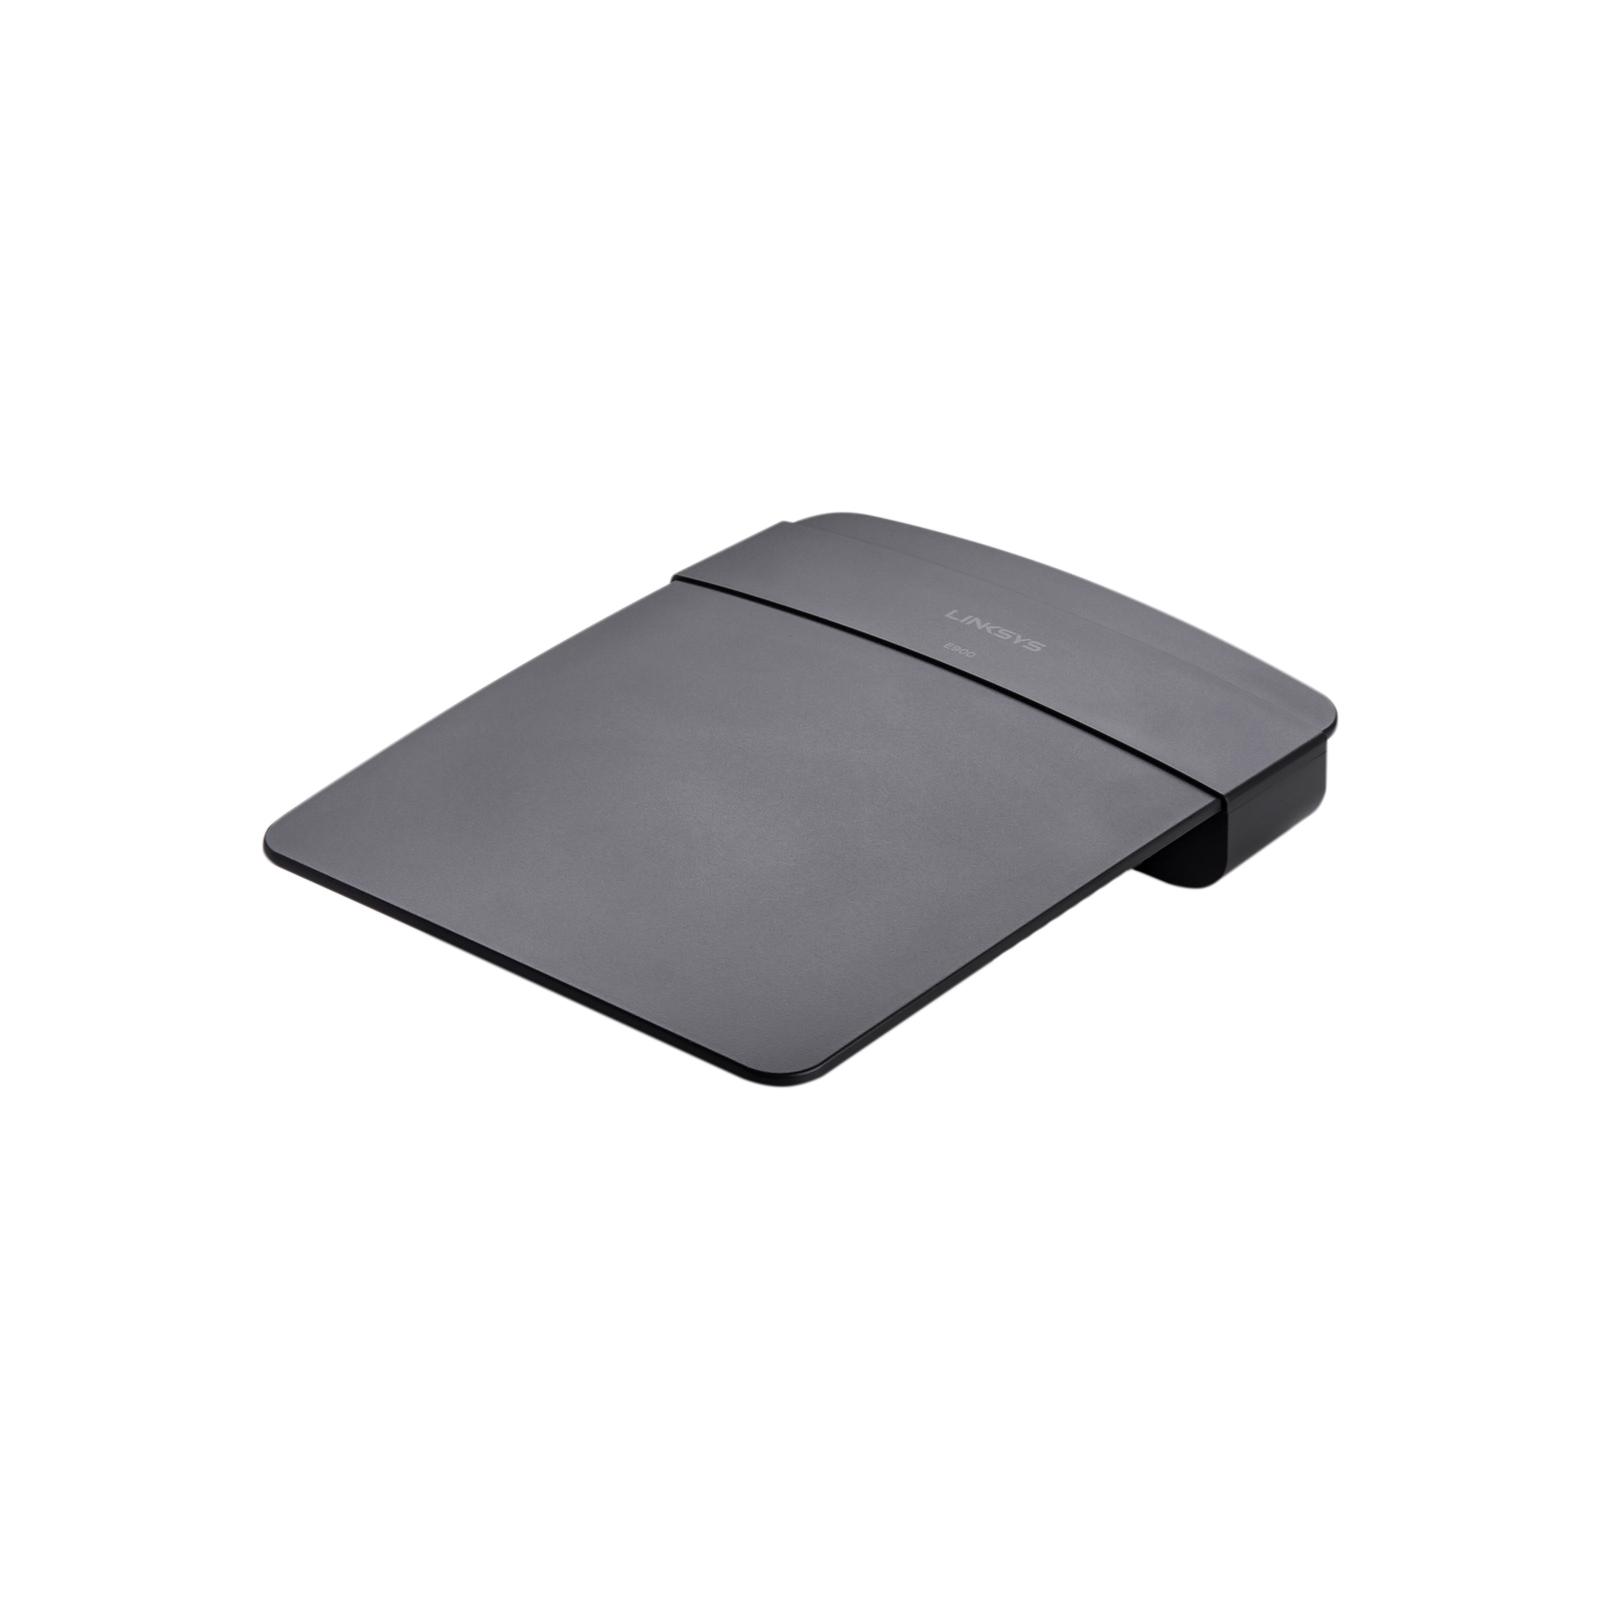 Маршрутизатор LinkSys E900 изображение 4